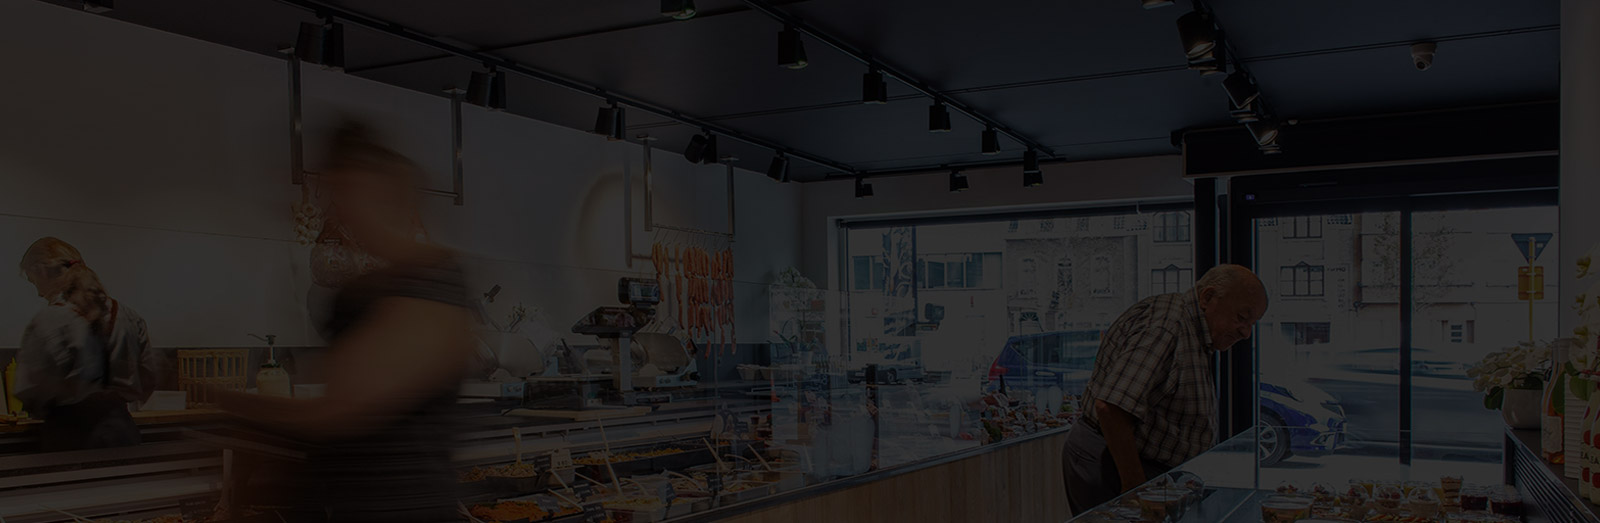 Degustatieweekend Duroc d'Olives op zaterdag 7 maart 2020